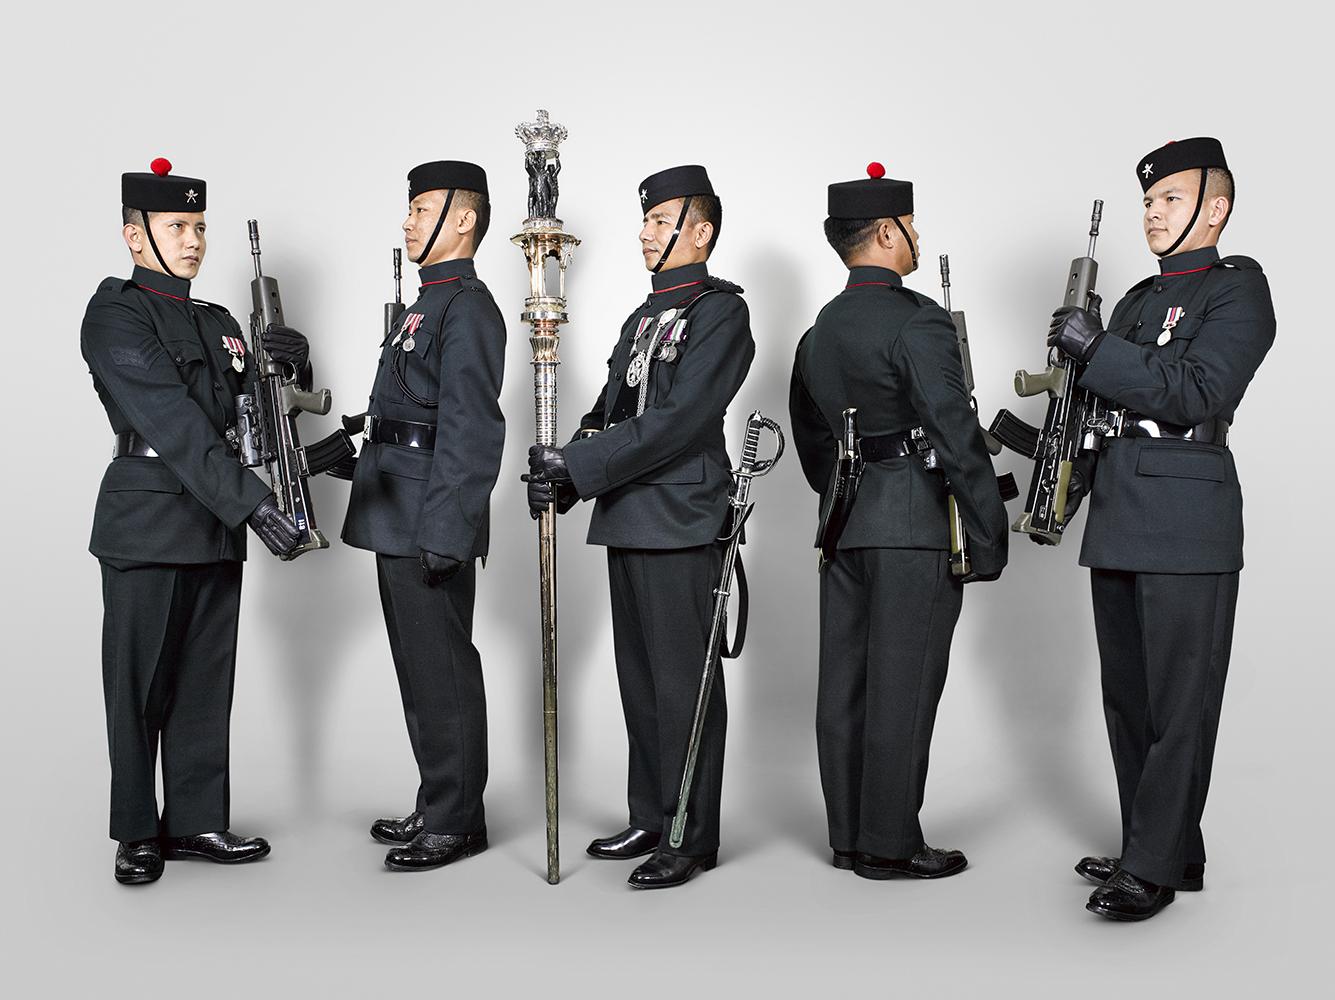 The Queen's Truncheon 2nd Battalion Royal Gurkha Rifles.jpg